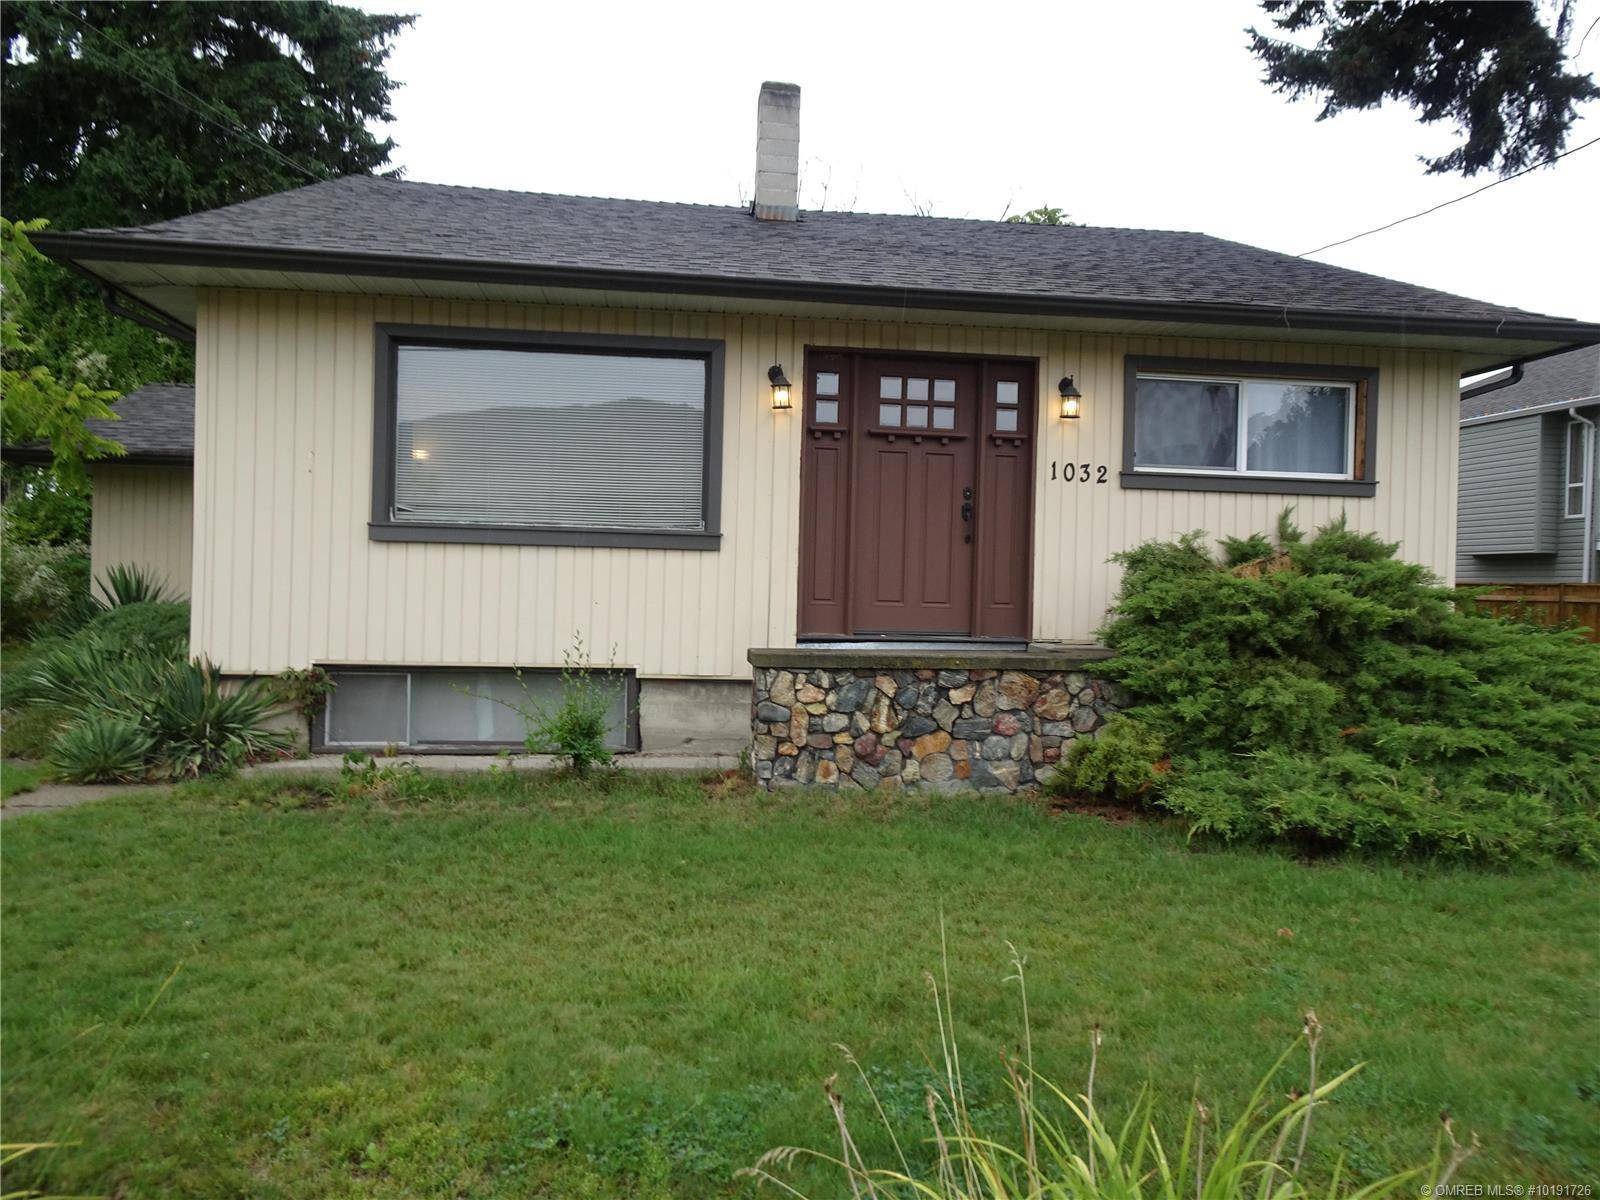 House for sale at 1032 Rutland Rd North Kelowna British Columbia - MLS: 10191726